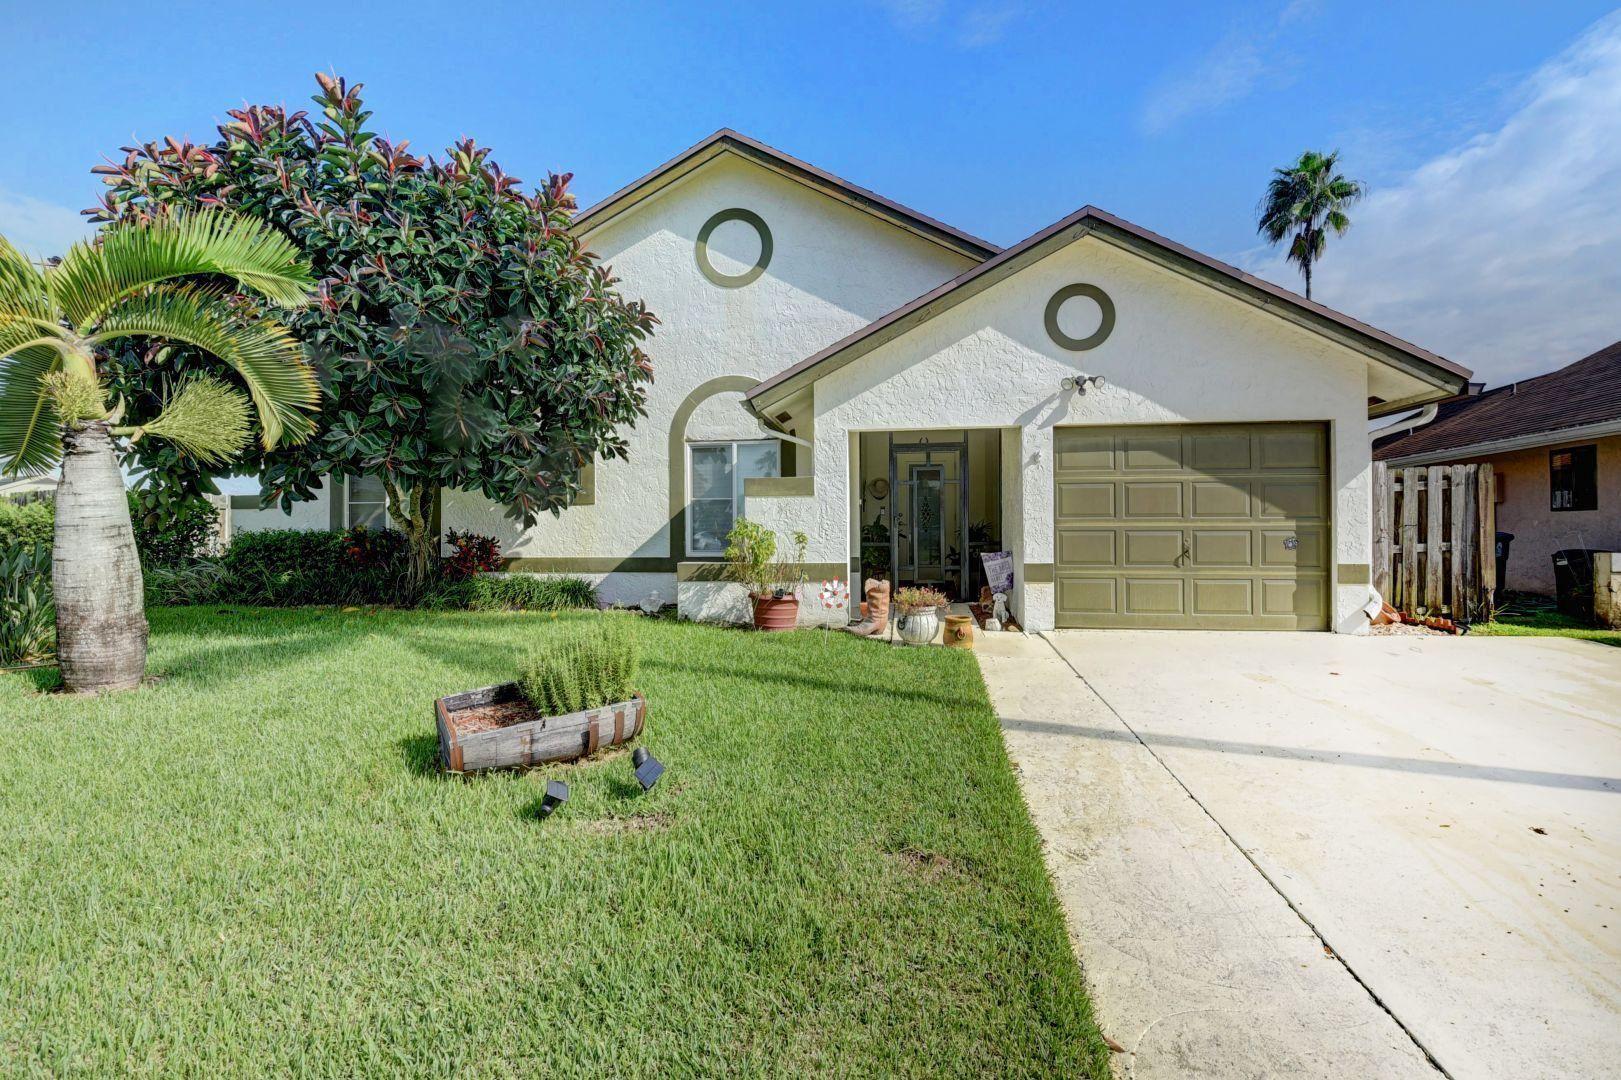 22533 Swordfish Drive, Boca Raton, FL 33428 - #: RX-10659224